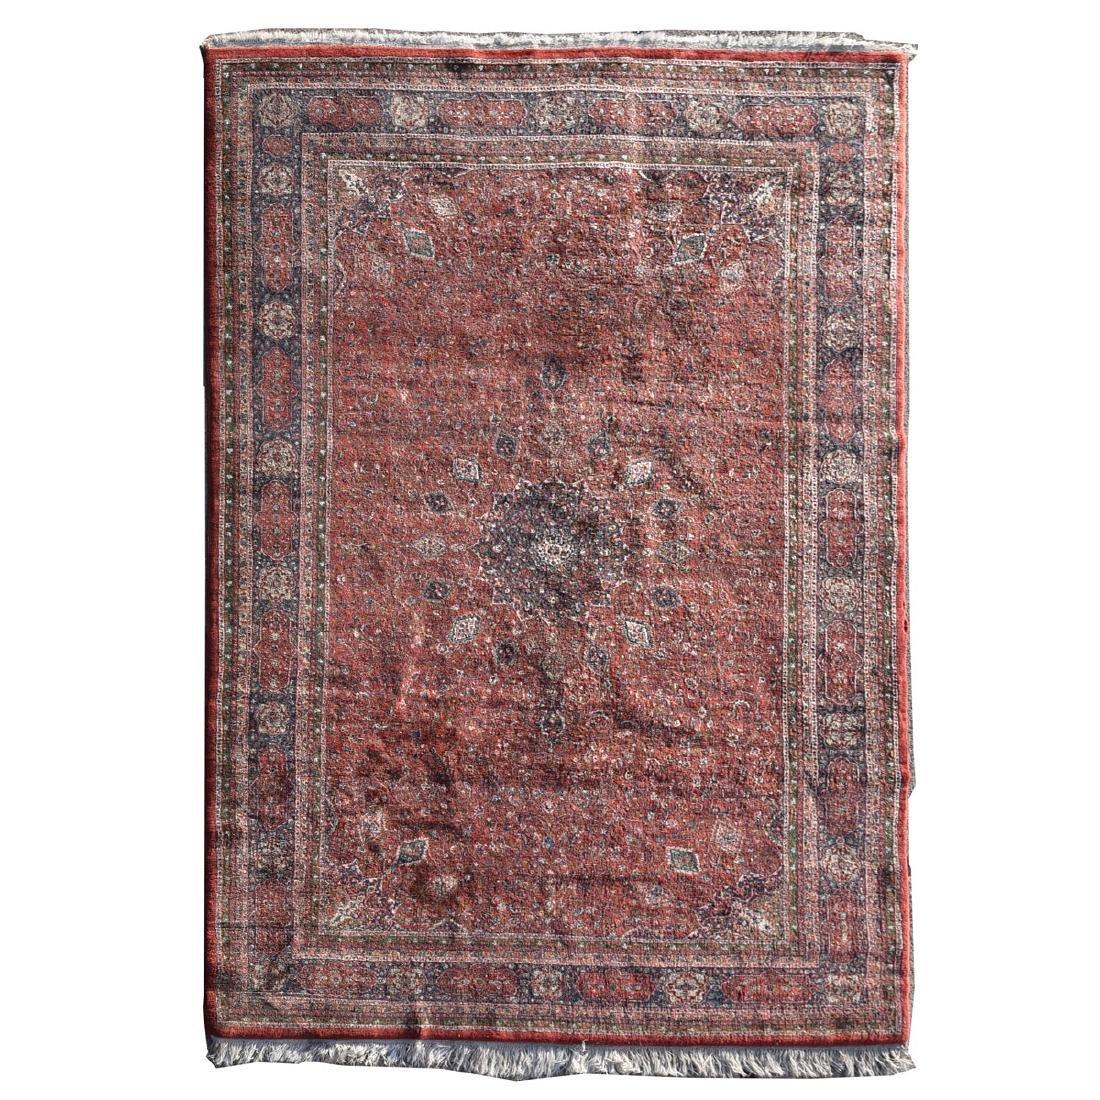 Indian Carpet, Red Ground, Blue Border, Dense